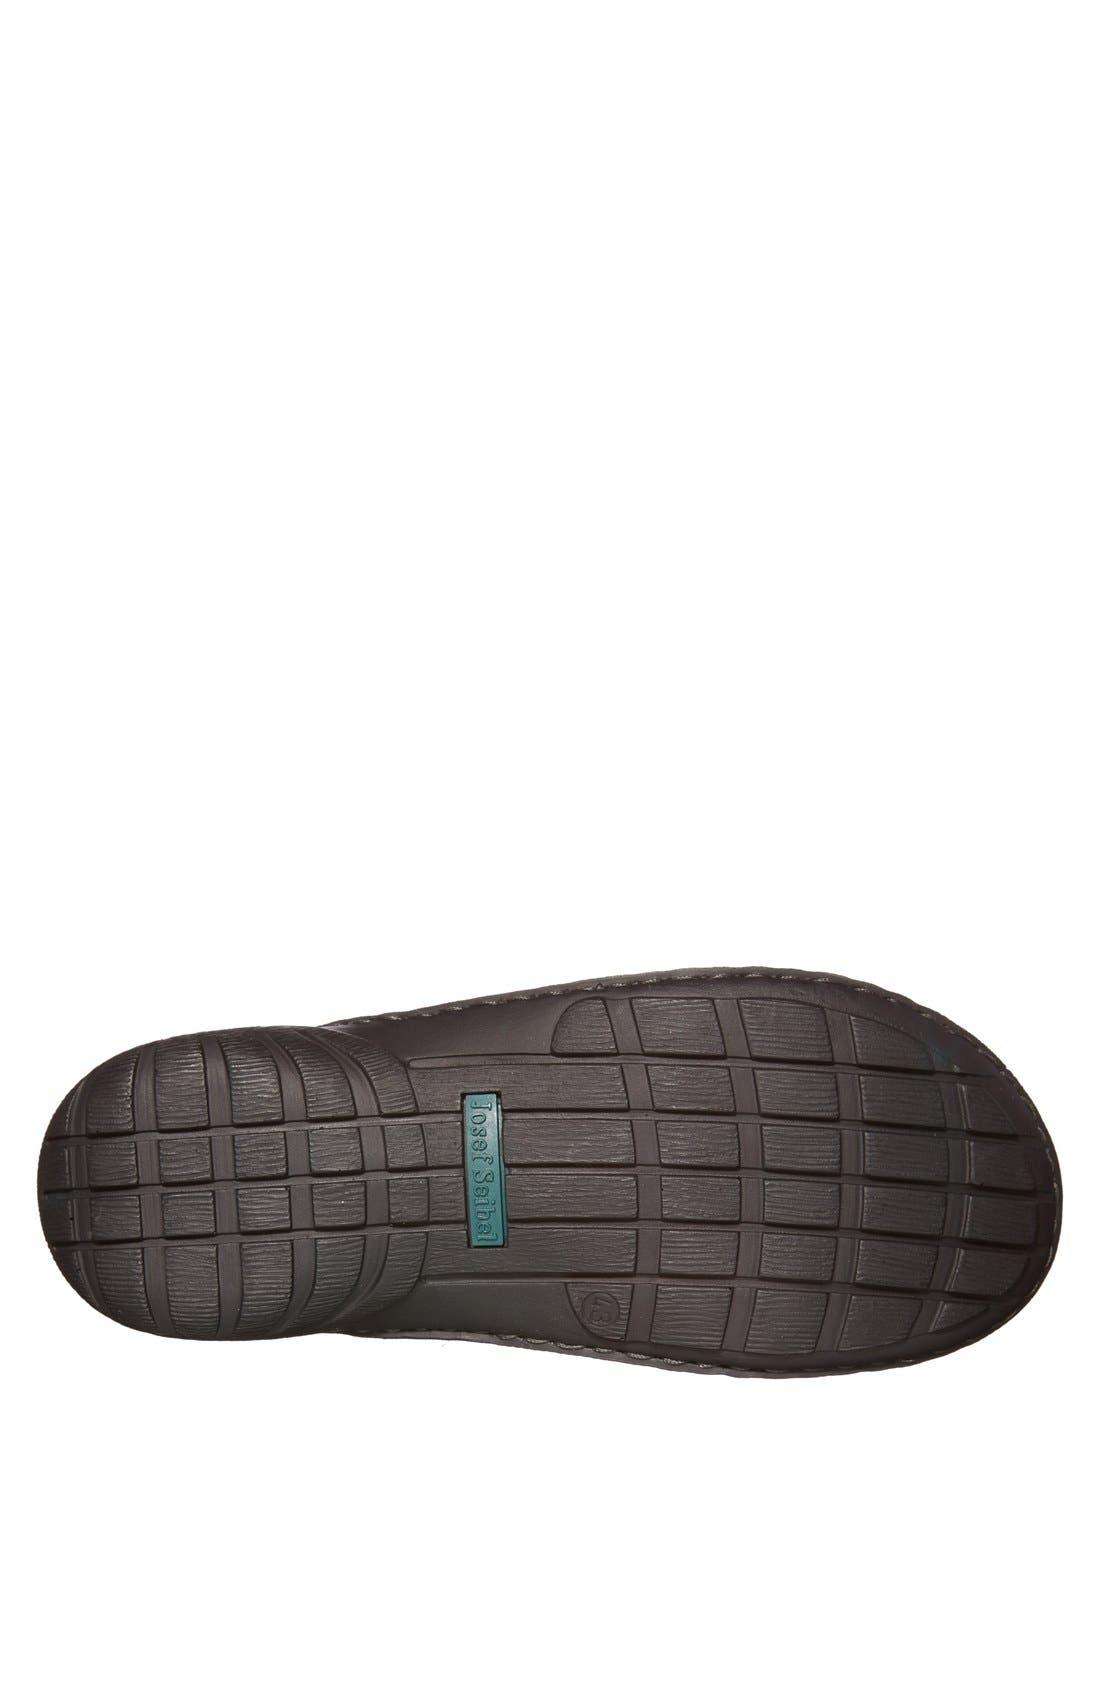 'Logan 21' Slide Sandal,                             Alternate thumbnail 4, color,